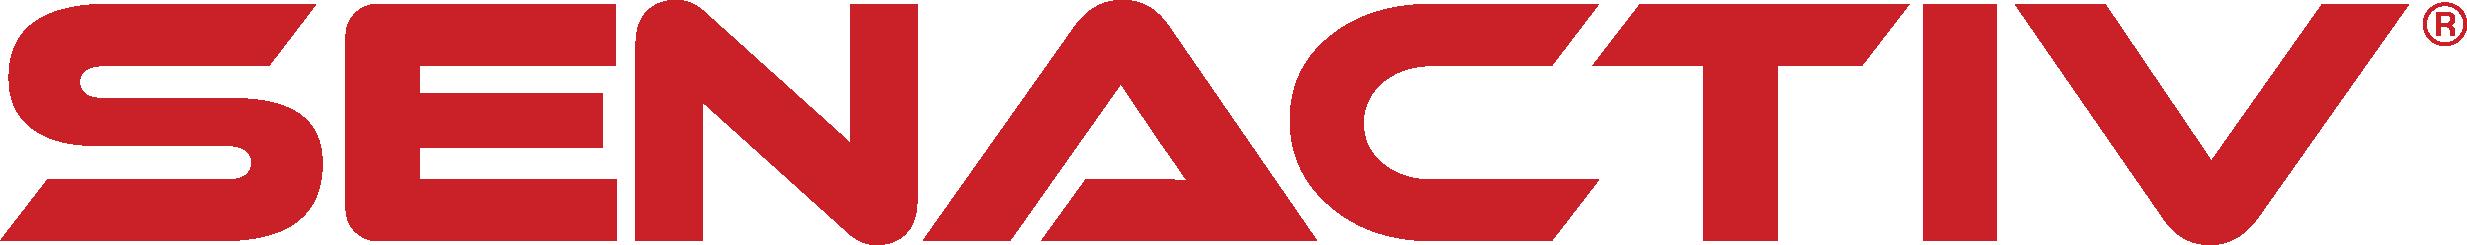 Senactiv-logo-red-1